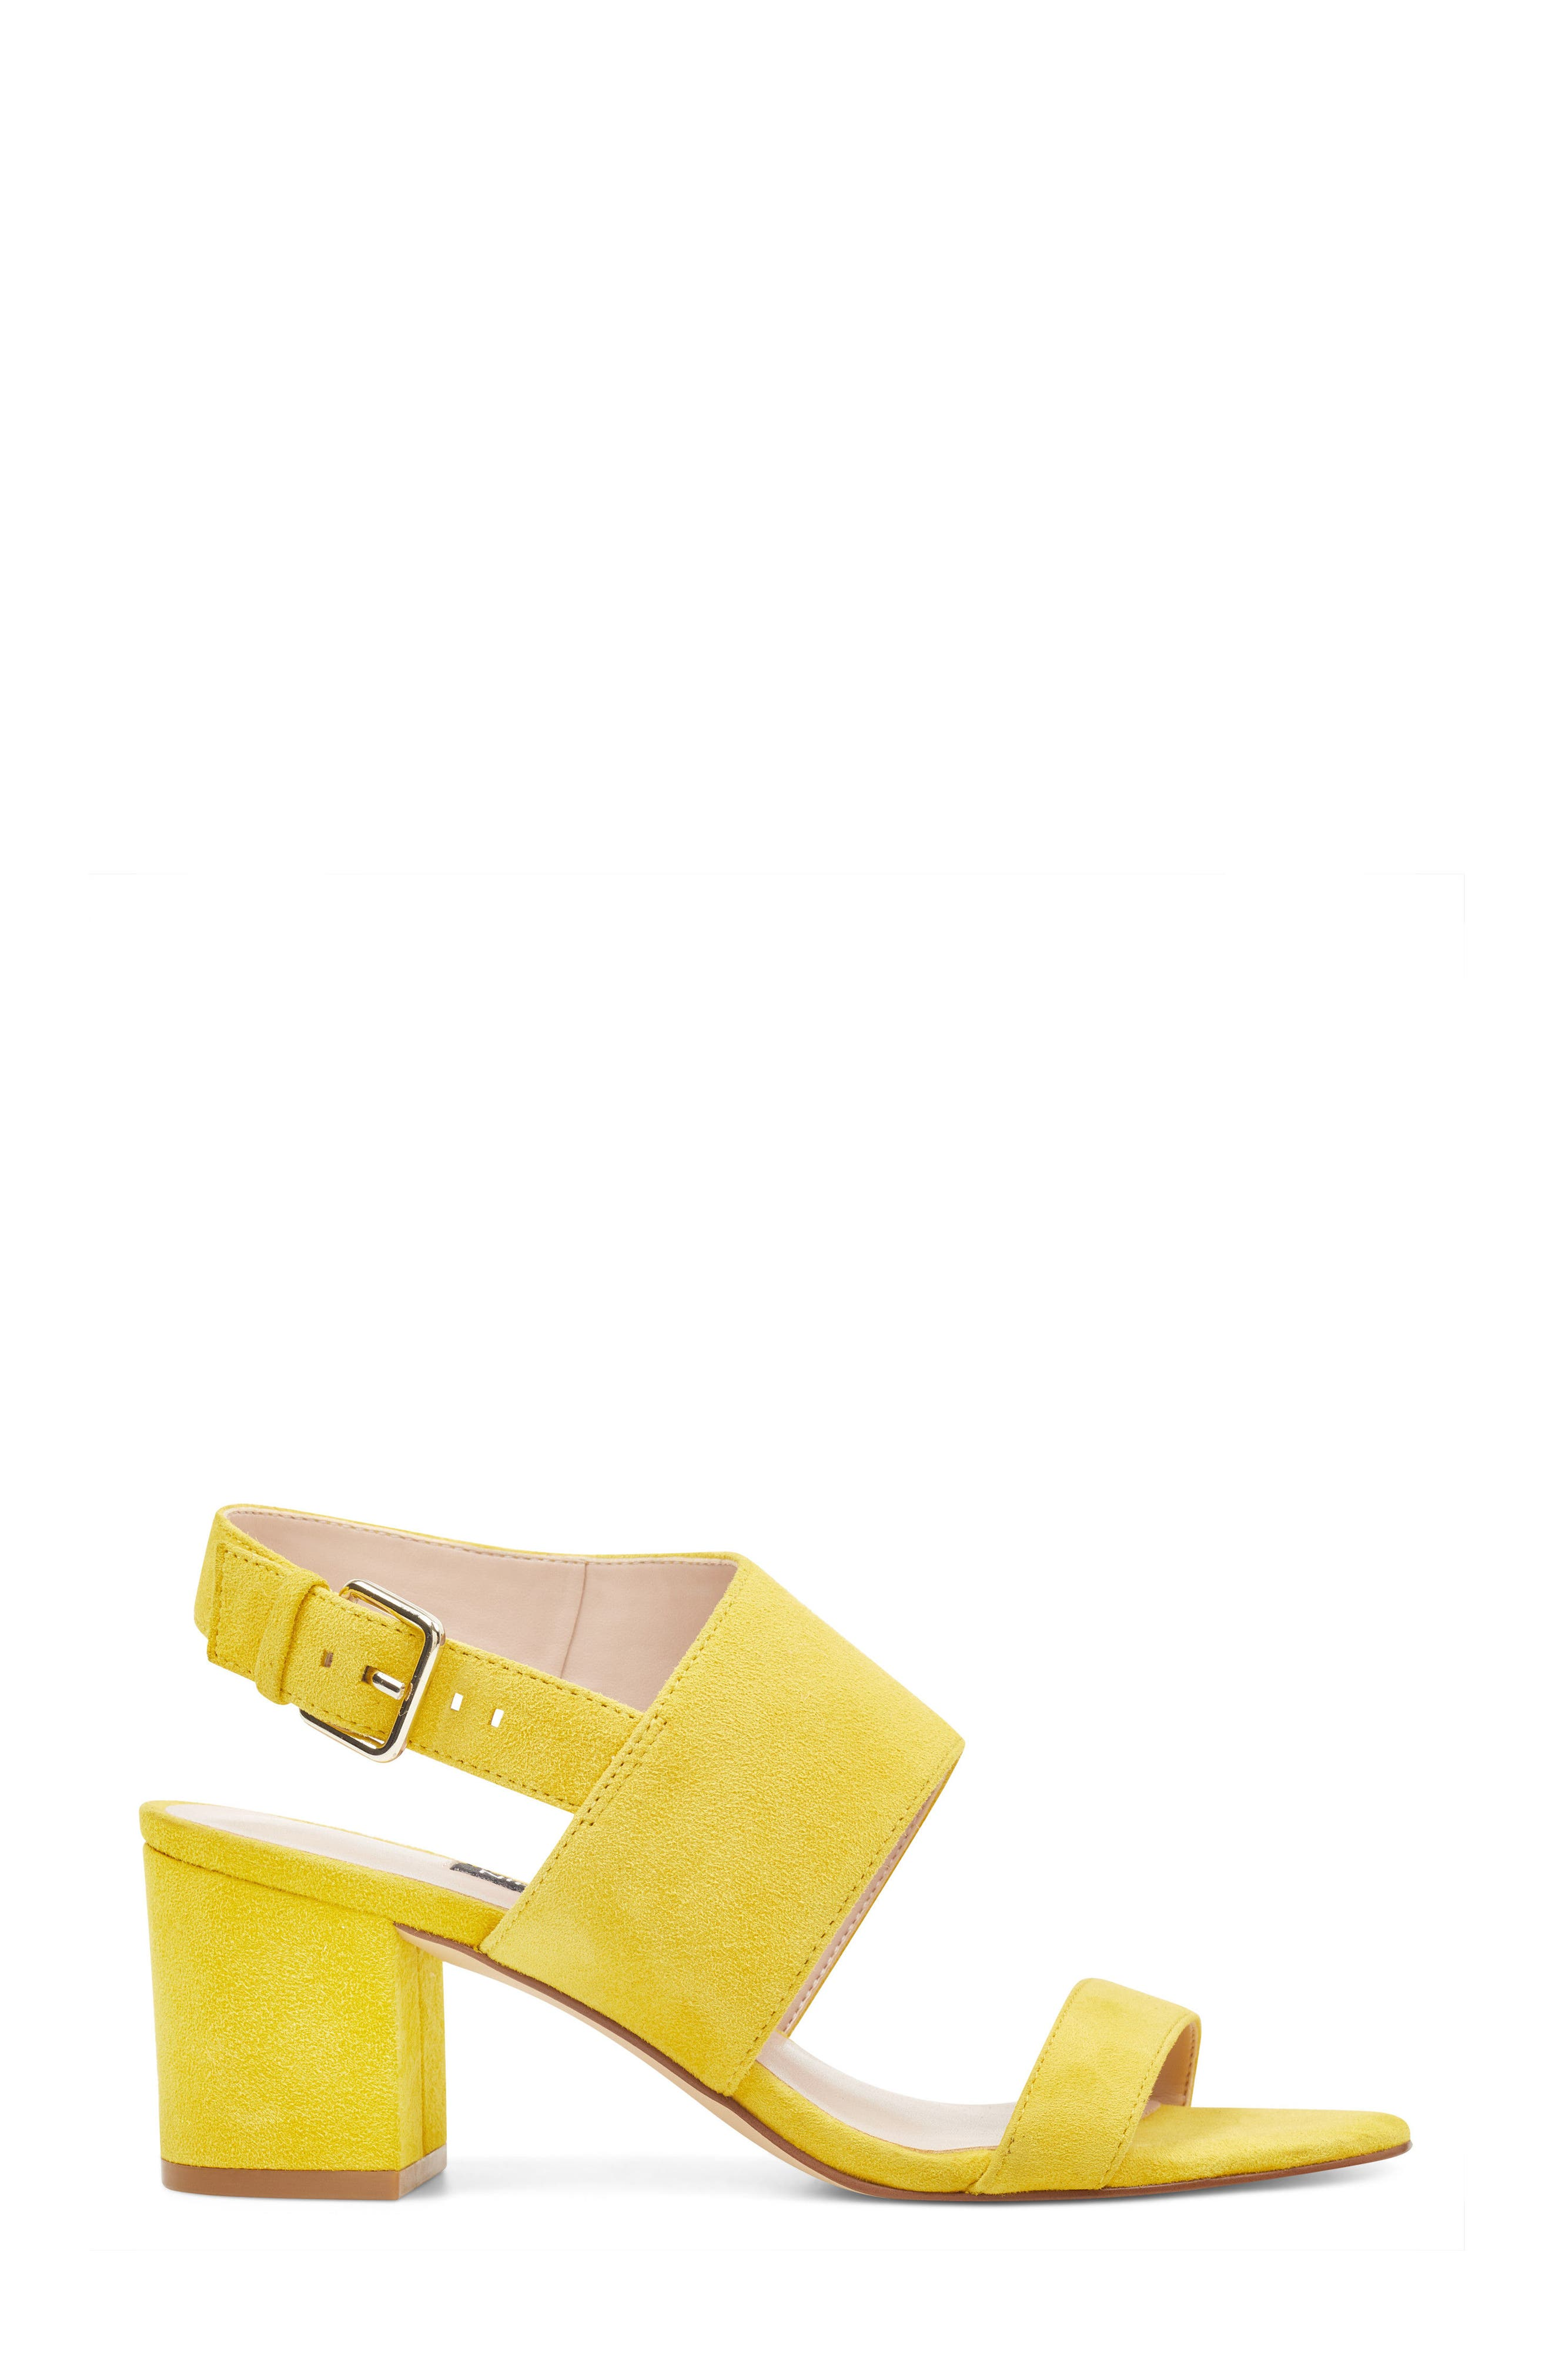 Forli Asymmetrical Sandal,                             Alternate thumbnail 3, color,                             Yellow Suede